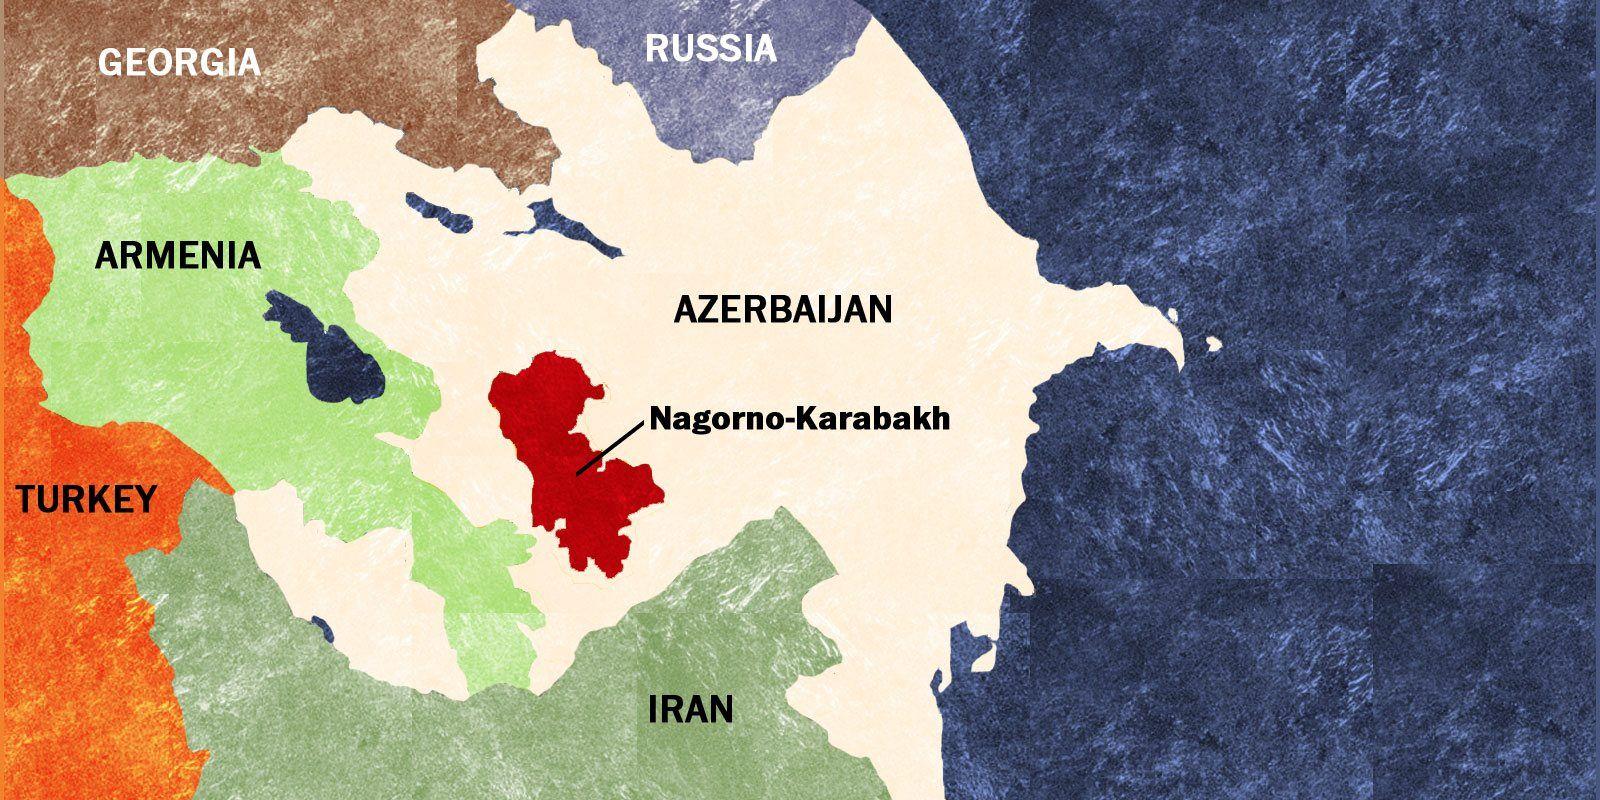 Artsakh in Eurasia ARTSAKHNAGORNO KARABAKHDISPUTED TERRITORY